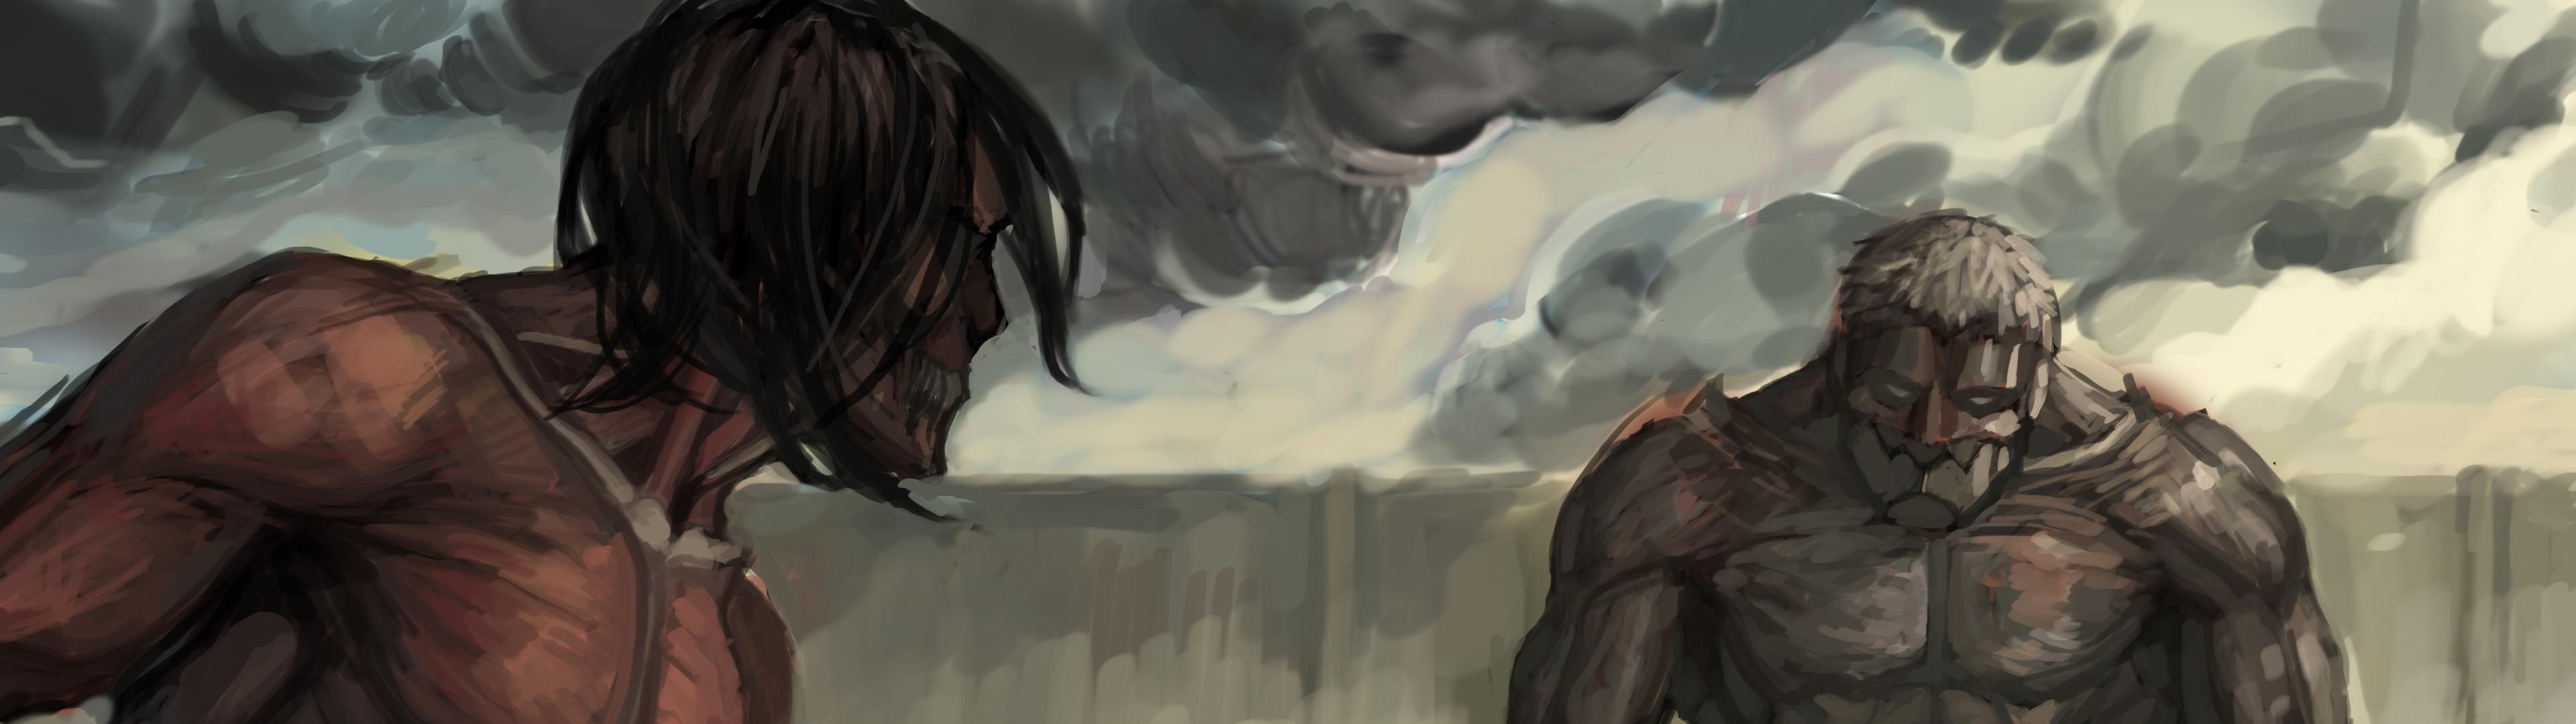 Attack On Titan Hd Wallpaper Background Image 3840x1080 Id